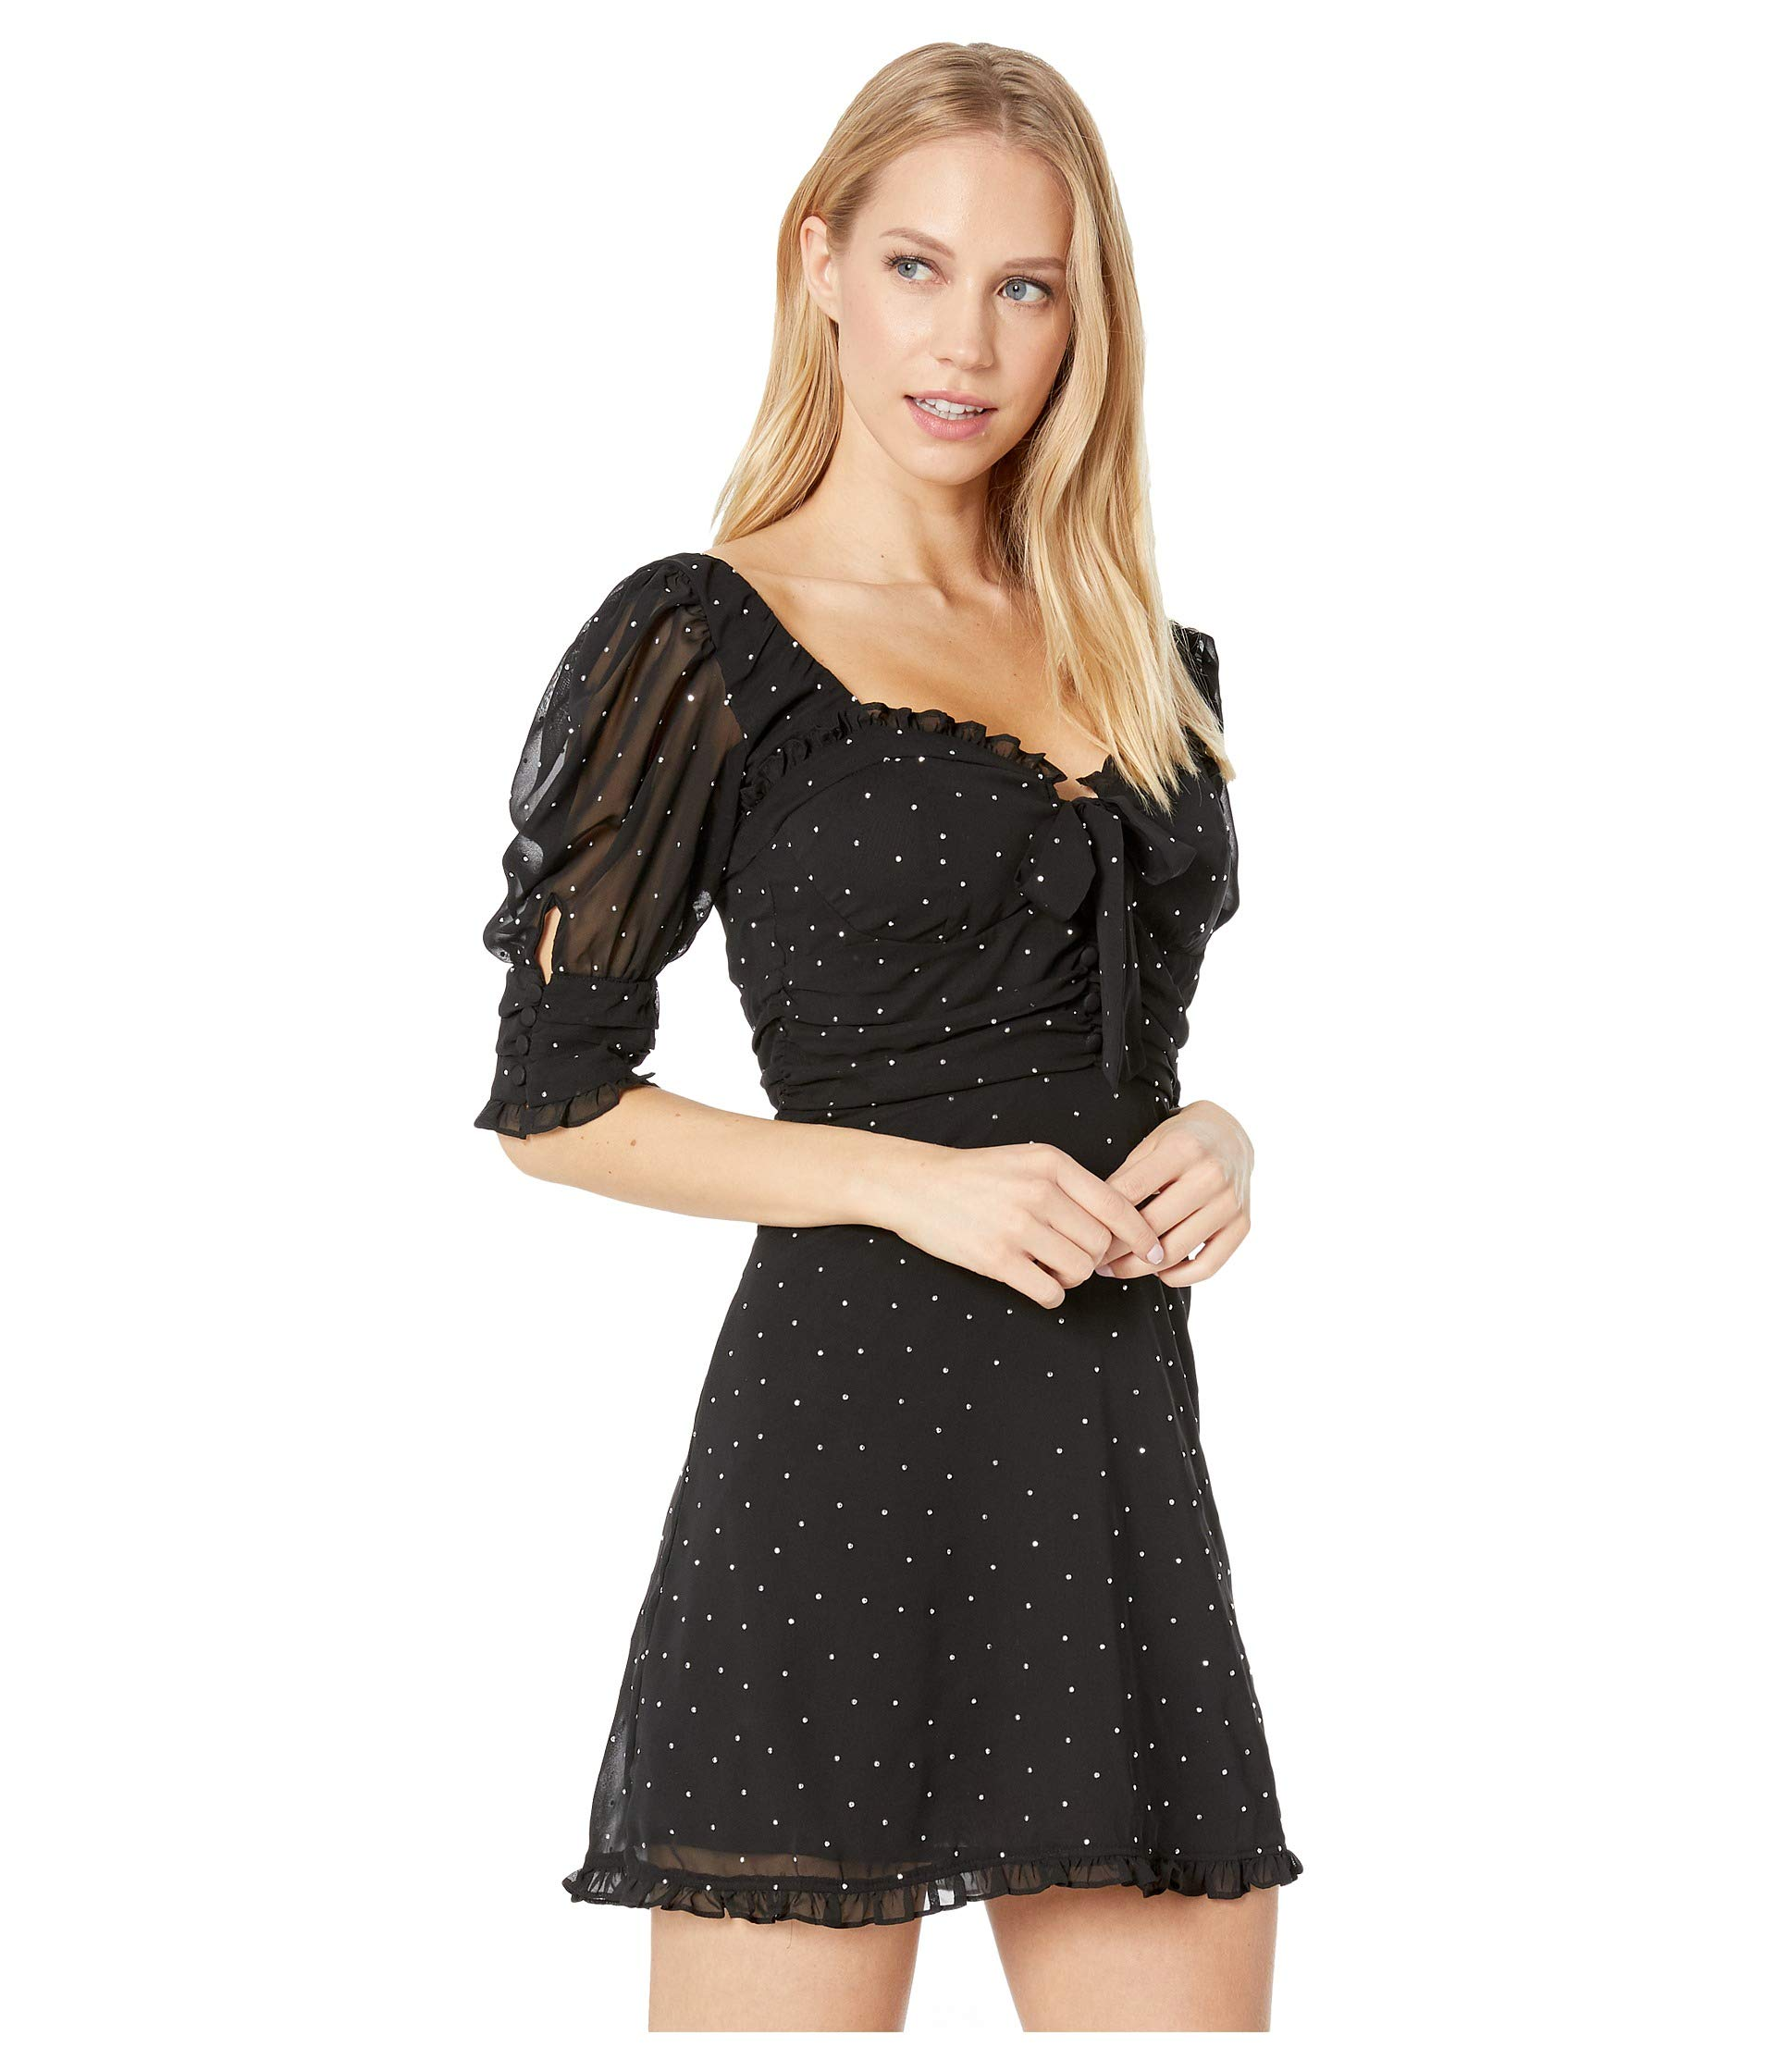 Lucky And For Twilight Dress Love Dice Mini Lemons vqxtTp